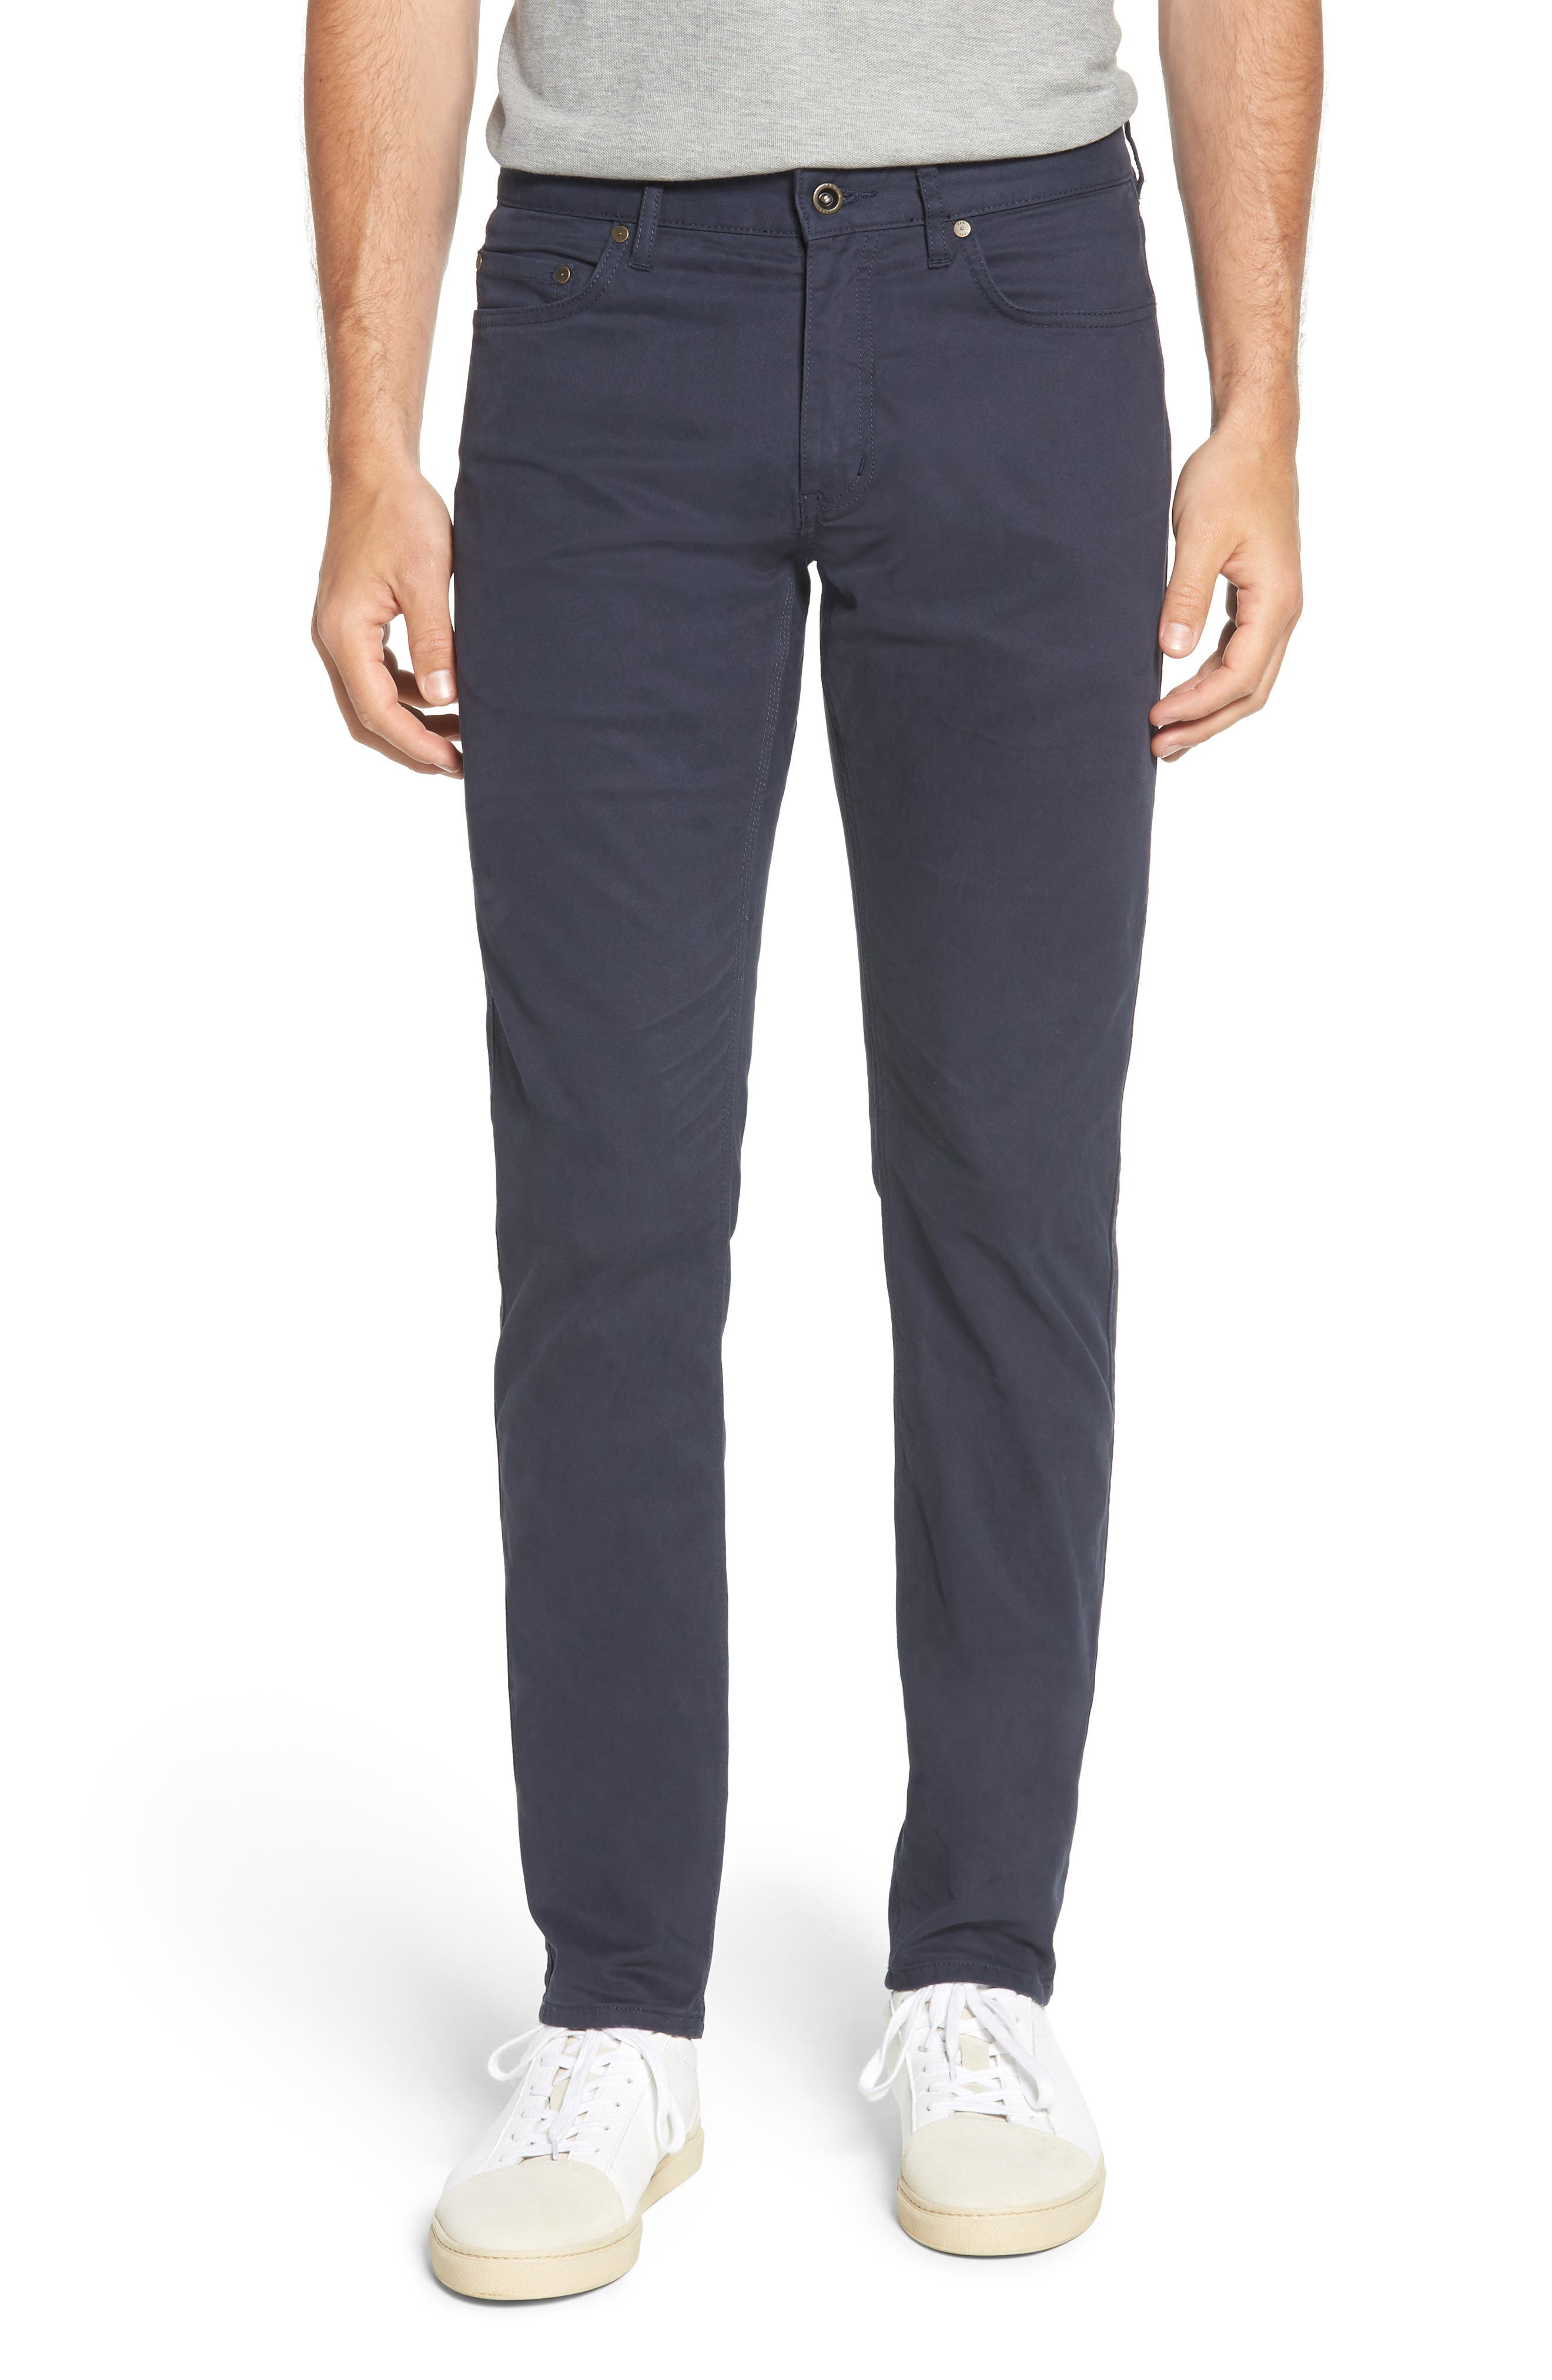 Fencourt Regular Fit Straight Leg Jeans,                         Main,                         color, MIDNIGHT